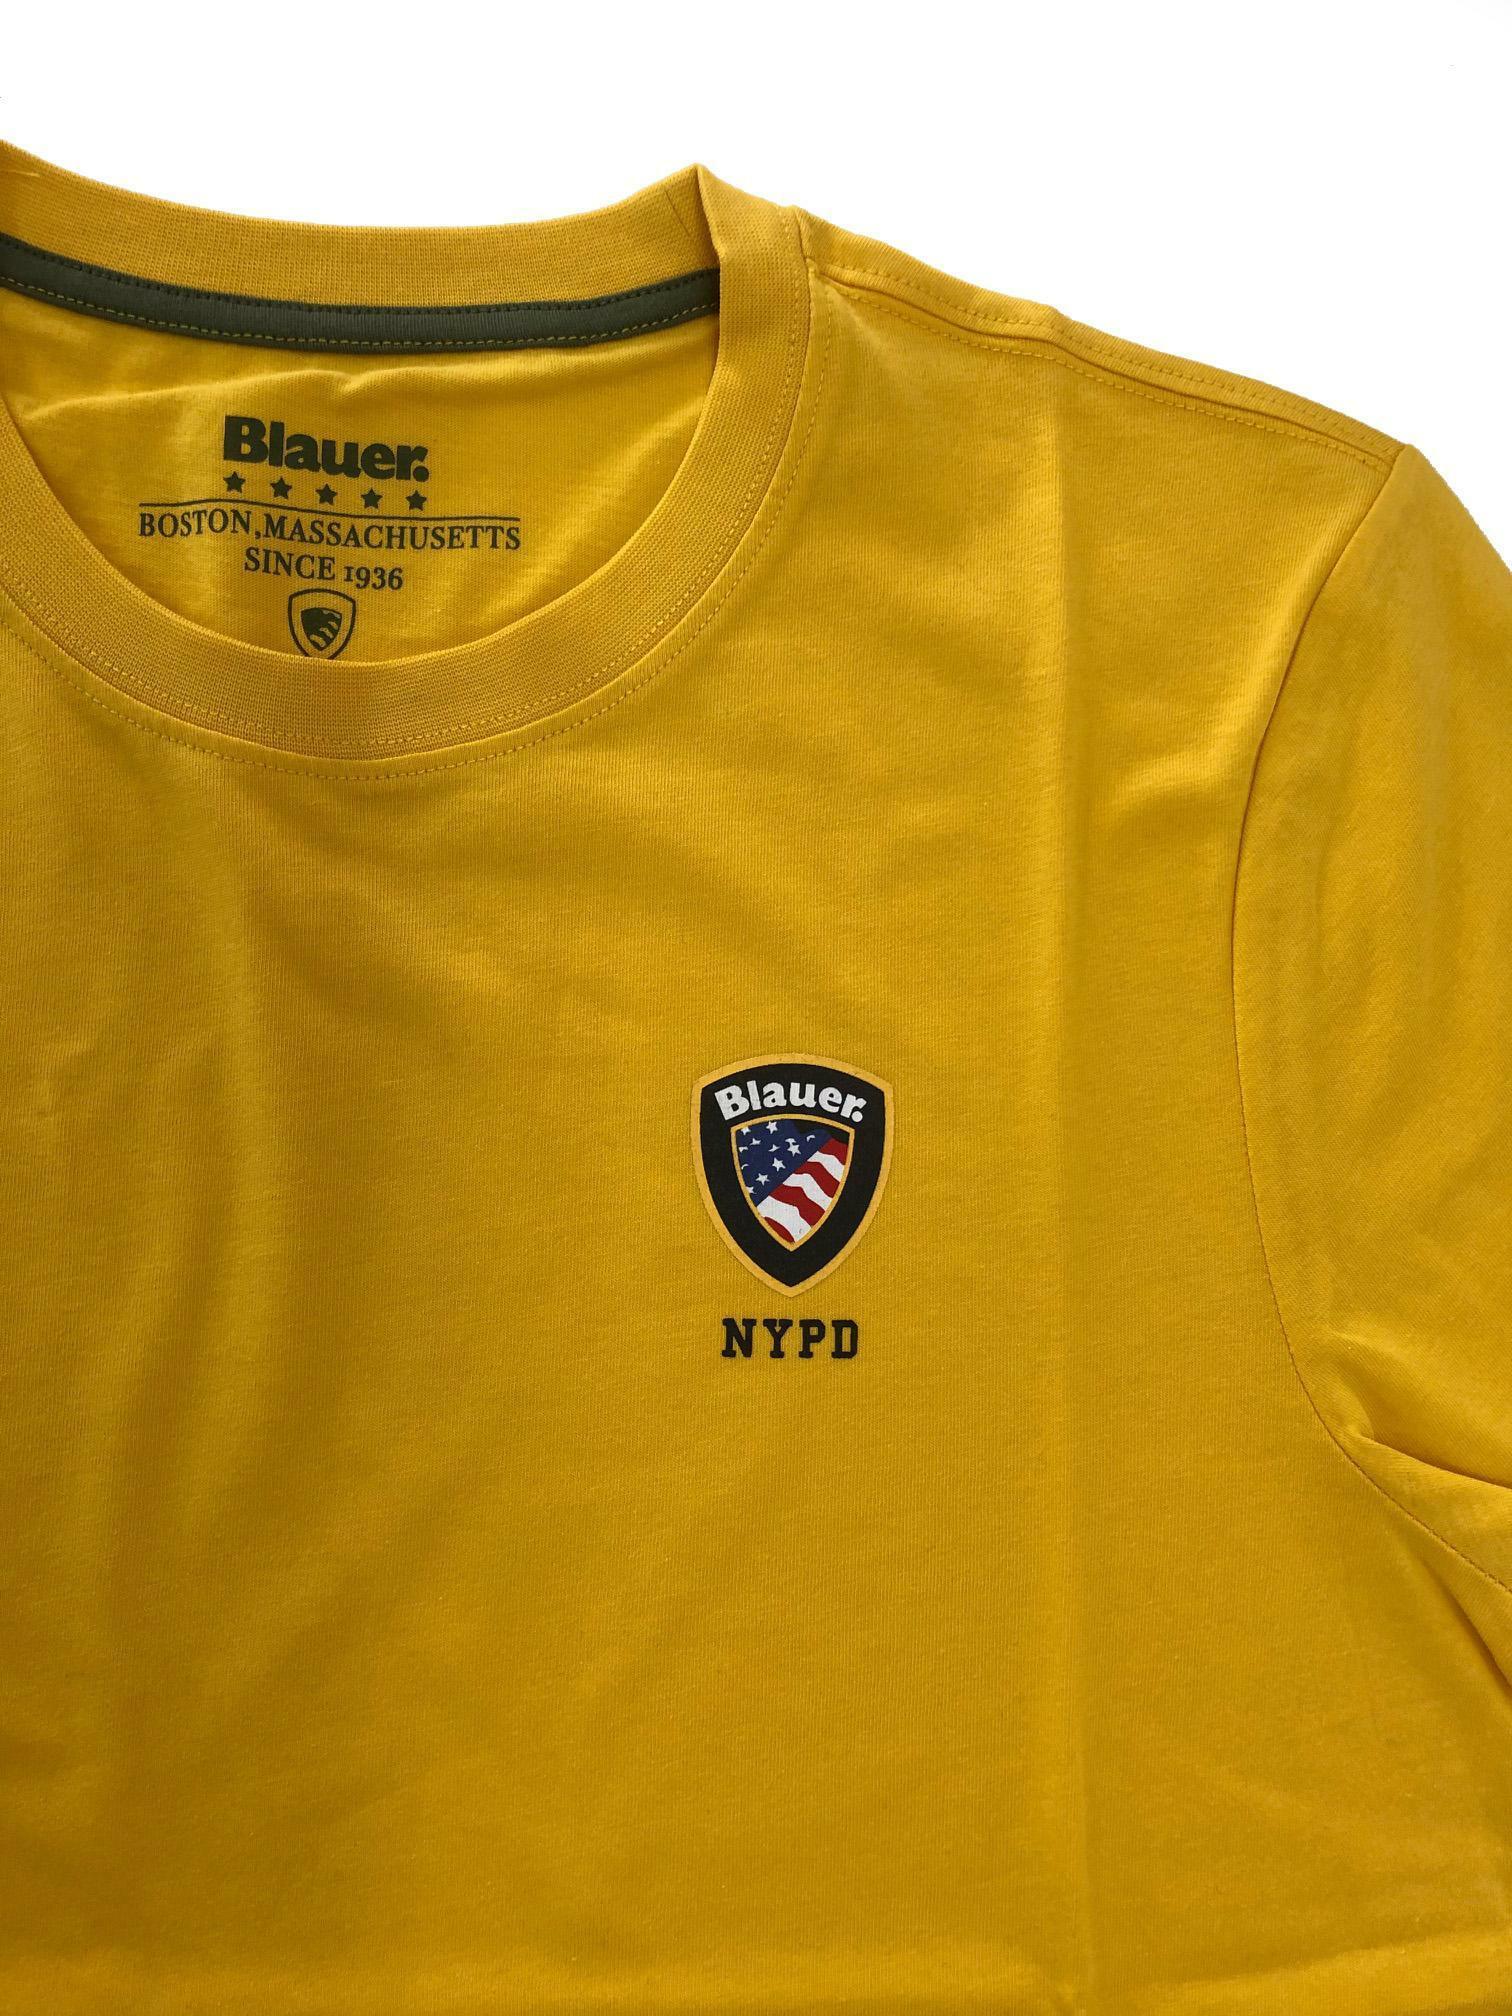 blauer t-shirt blauer uomo giallo 20sbluh02176